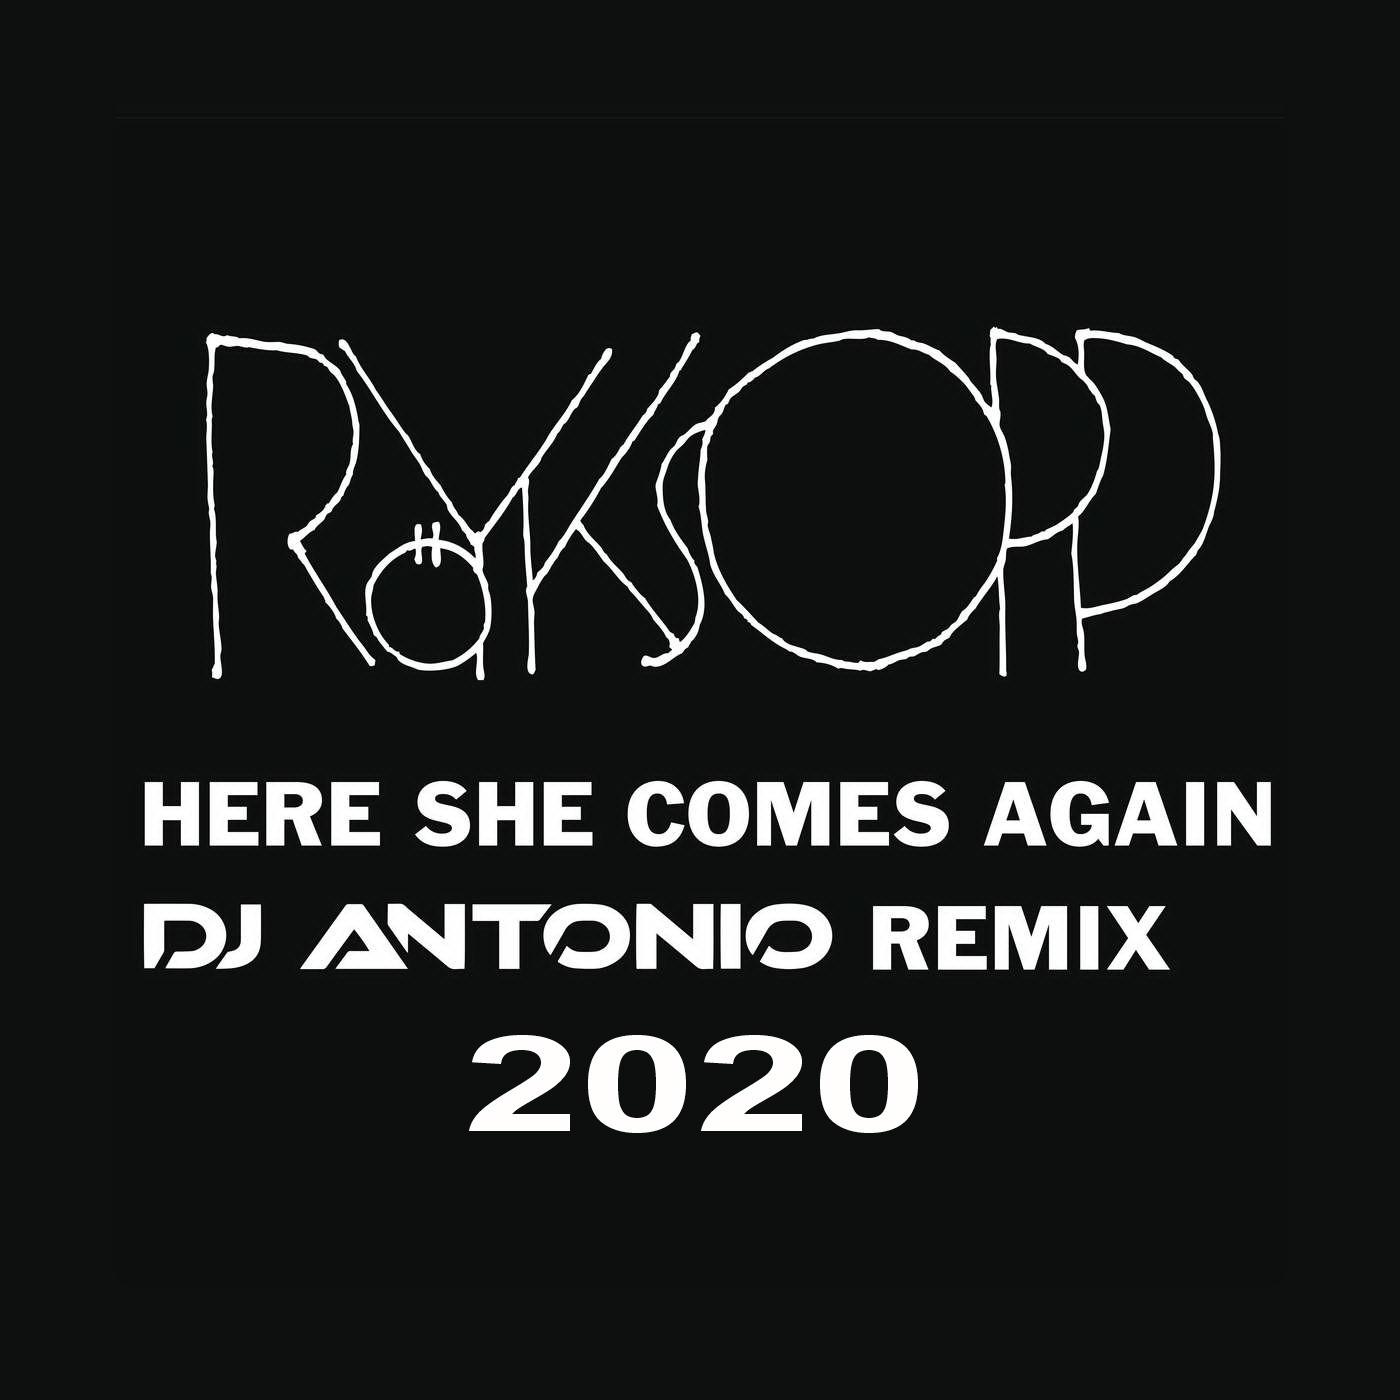 Royksopp - Here She Comes Again (Dj Antonio Remix 2020 Extended)